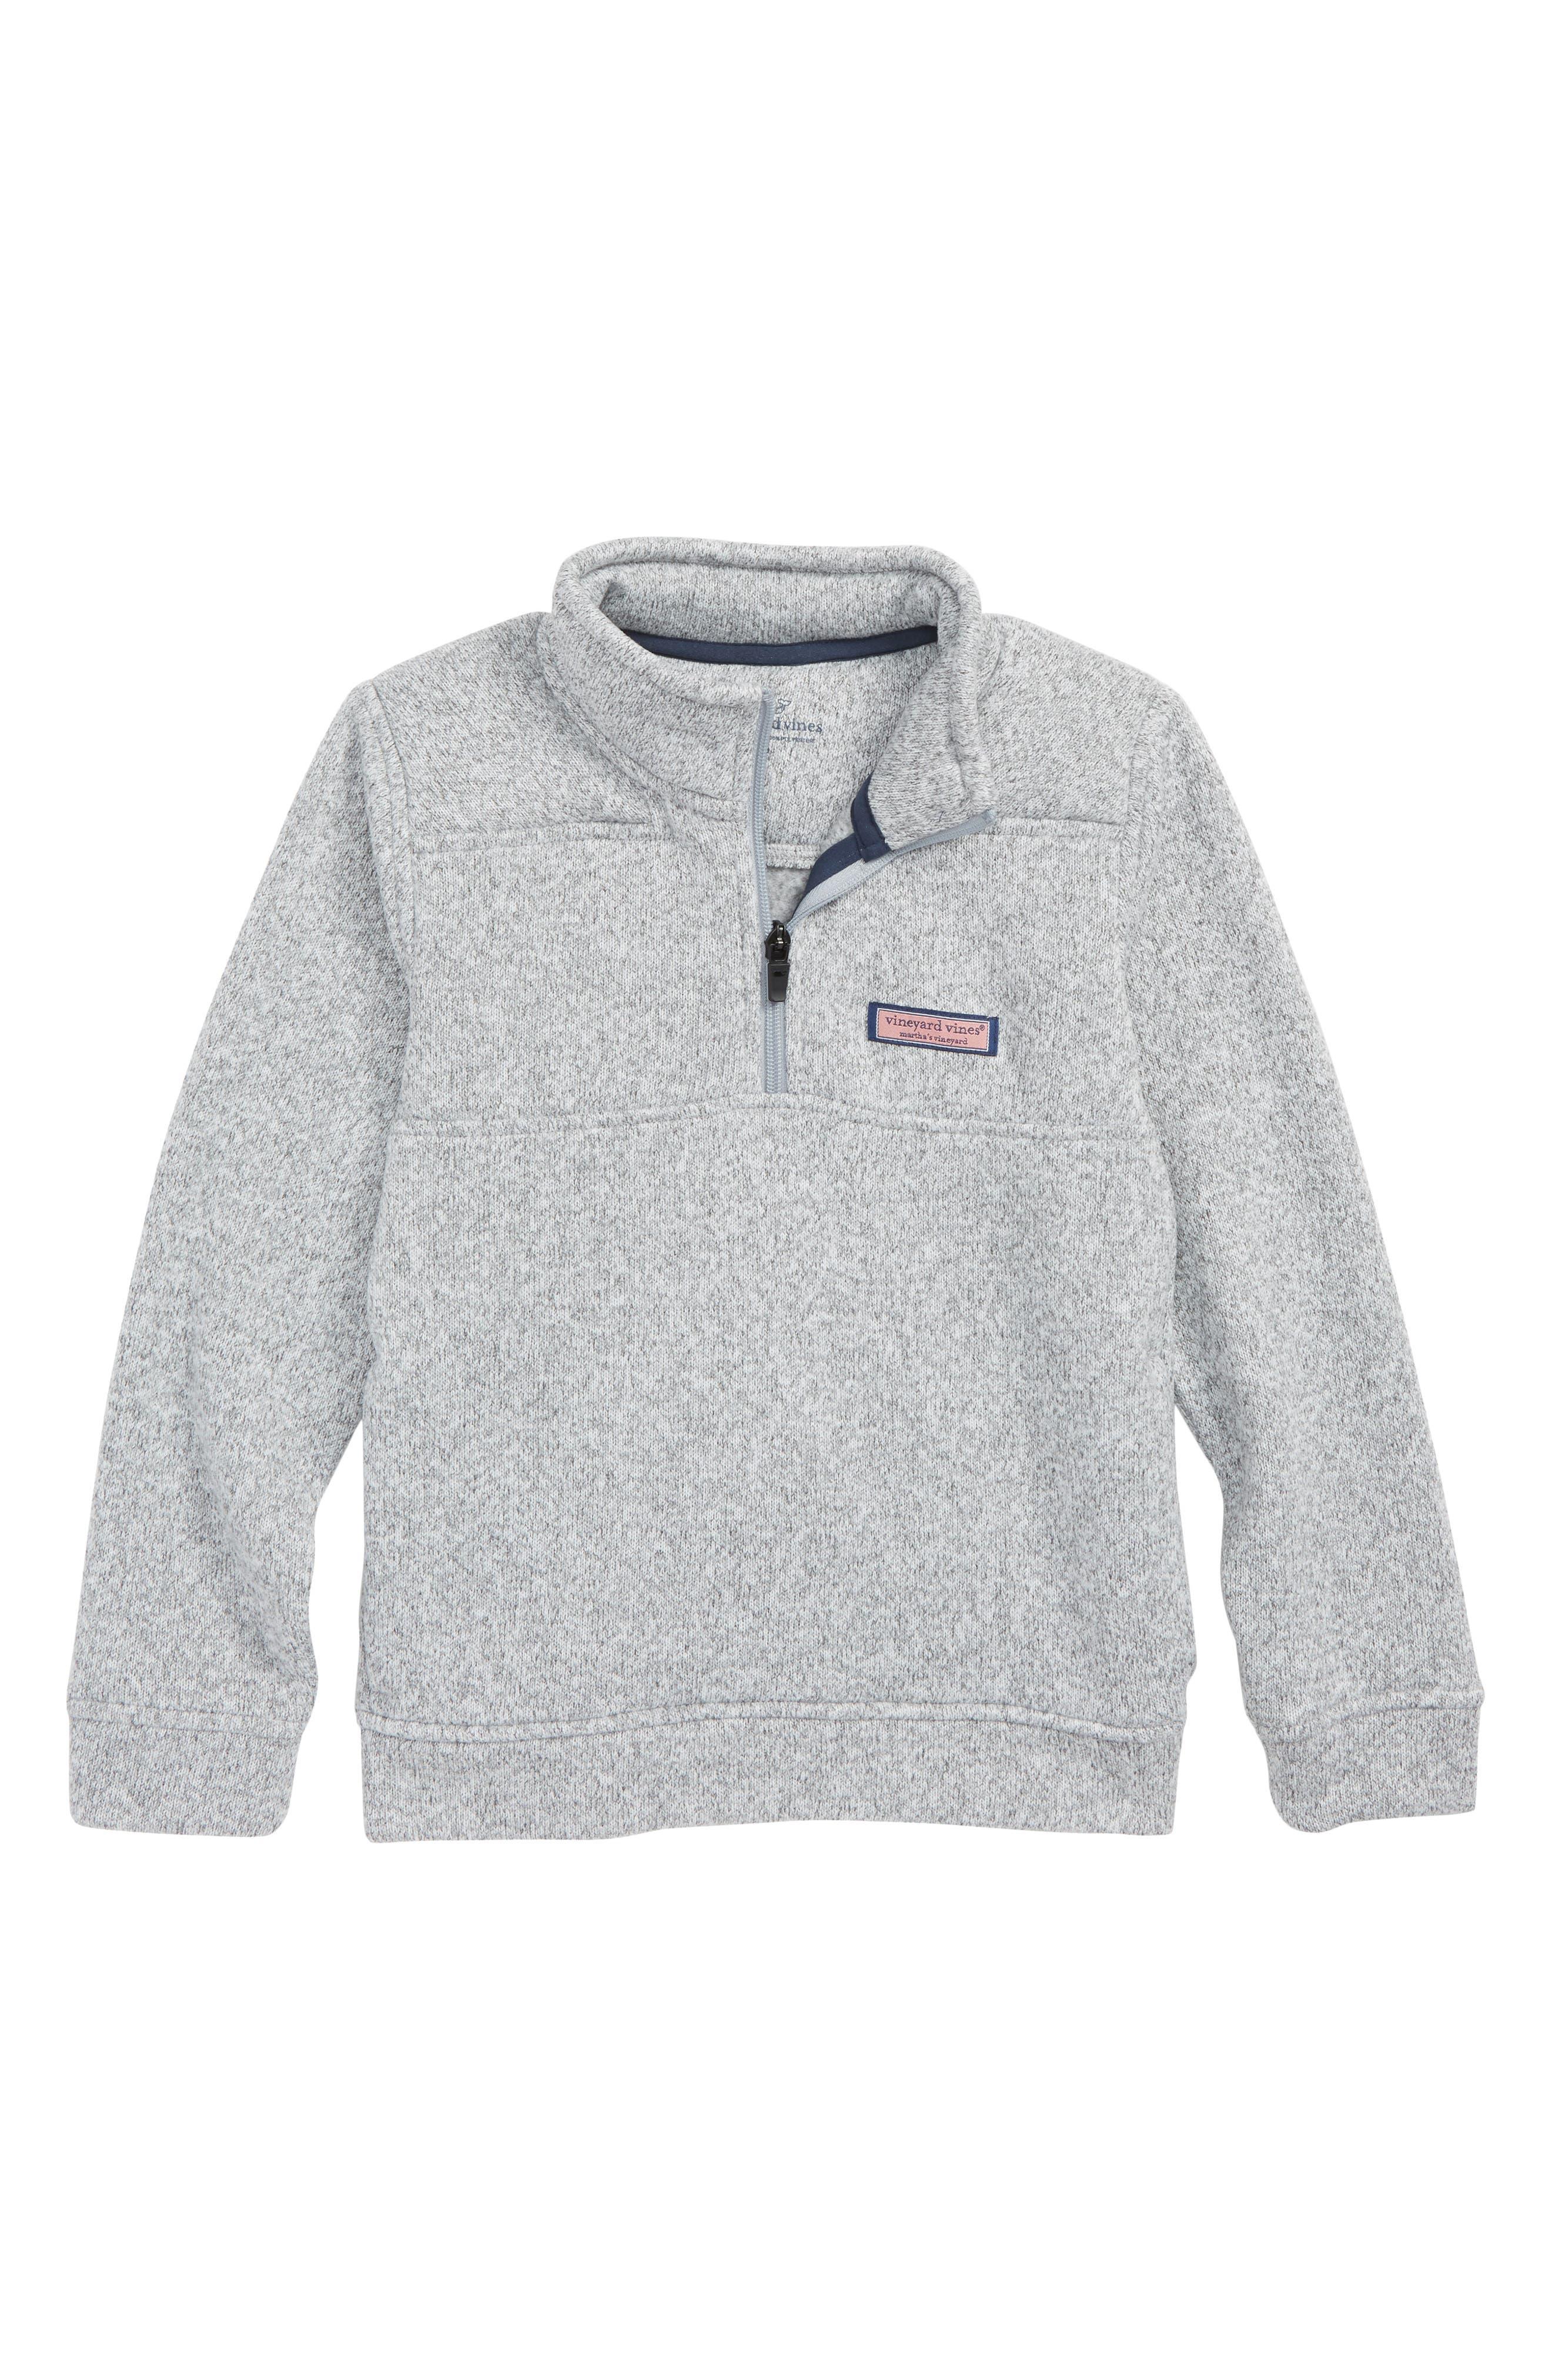 Fleece Shep Sweatshirt,                         Main,                         color, GRAY HEATHER